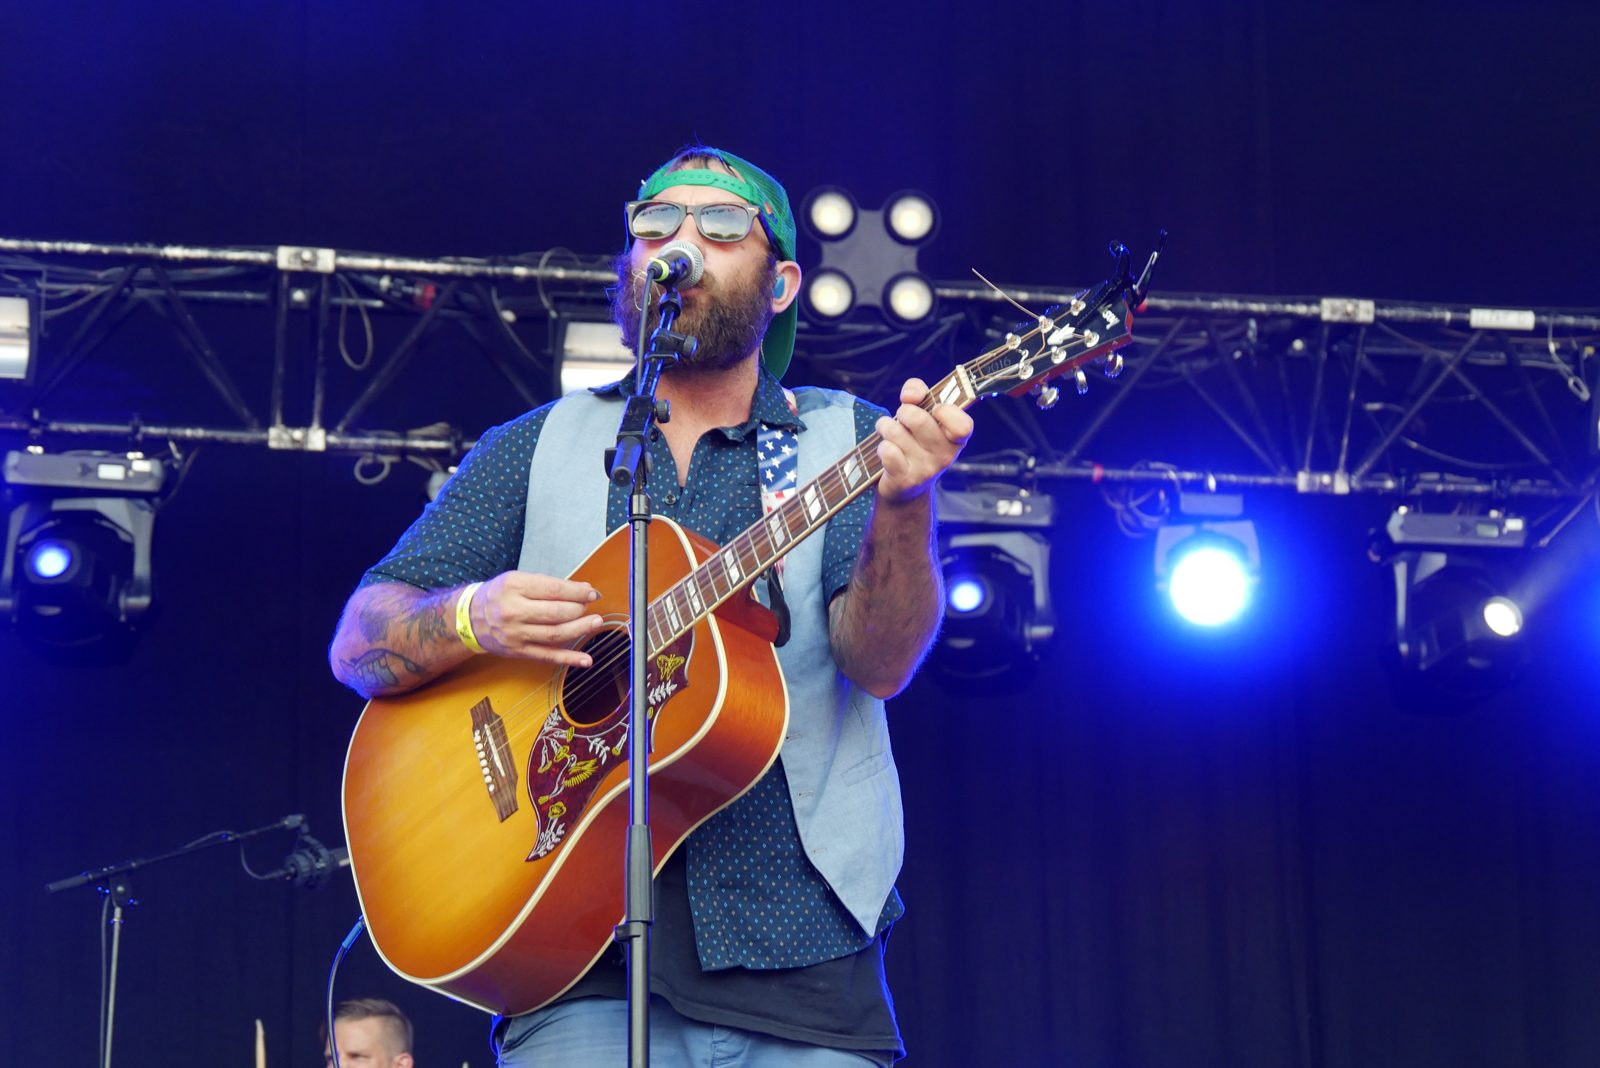 Simon Ward The Strumbellas live concert Rock en Seine 2016 festival paris stage photo usofparis blogjpg